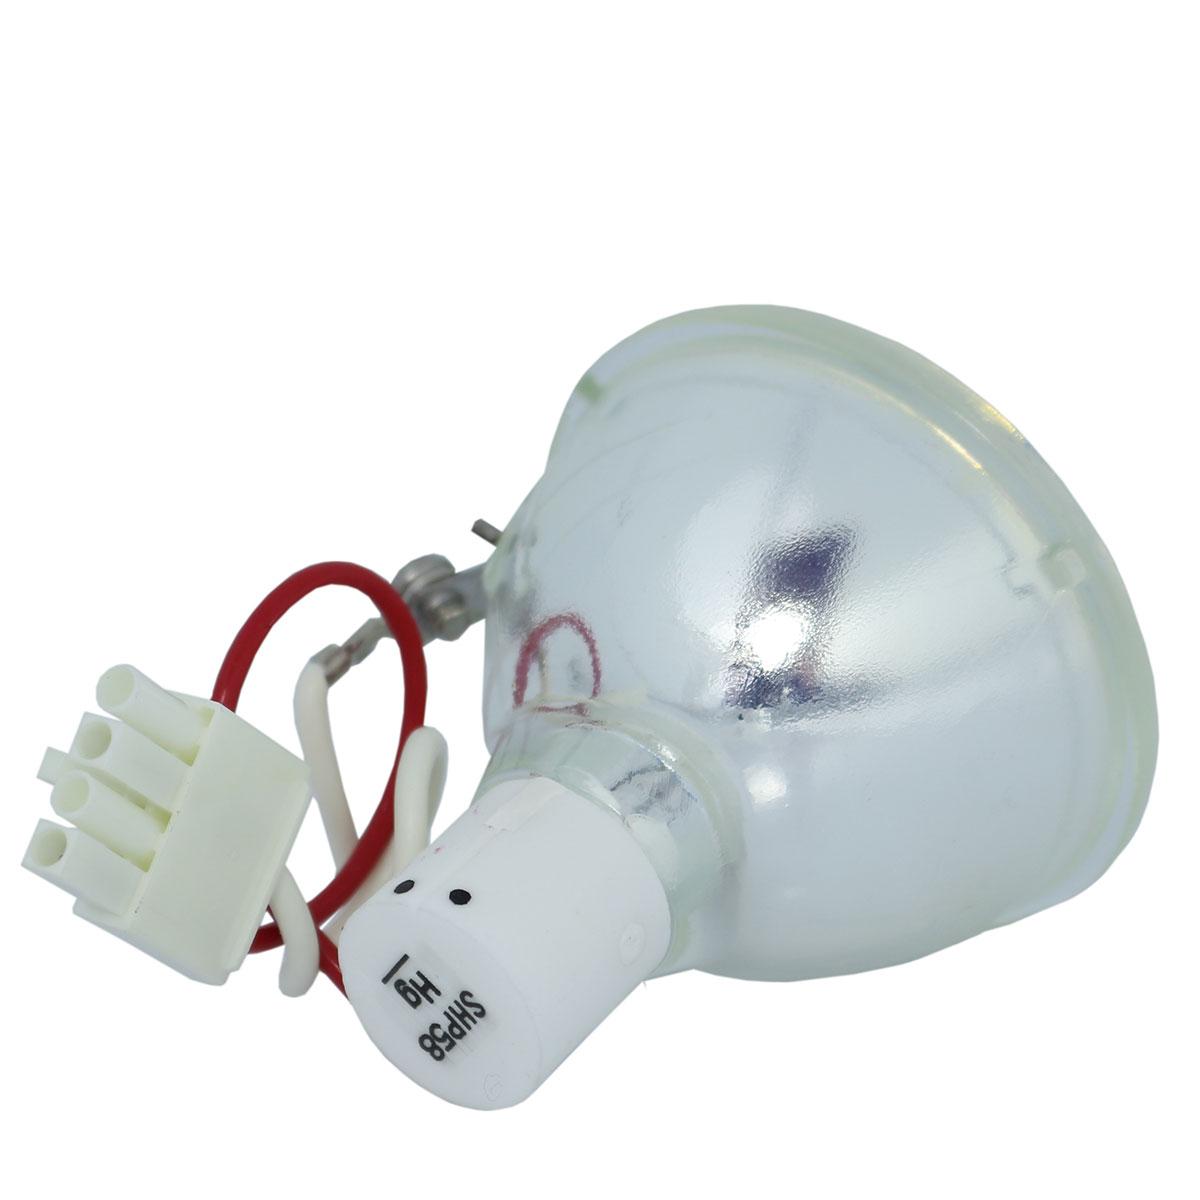 Original Phoenix Projector Lamp Replacement with Housing for Ask Proxima SP-LAMP-018 - image 3 de 5